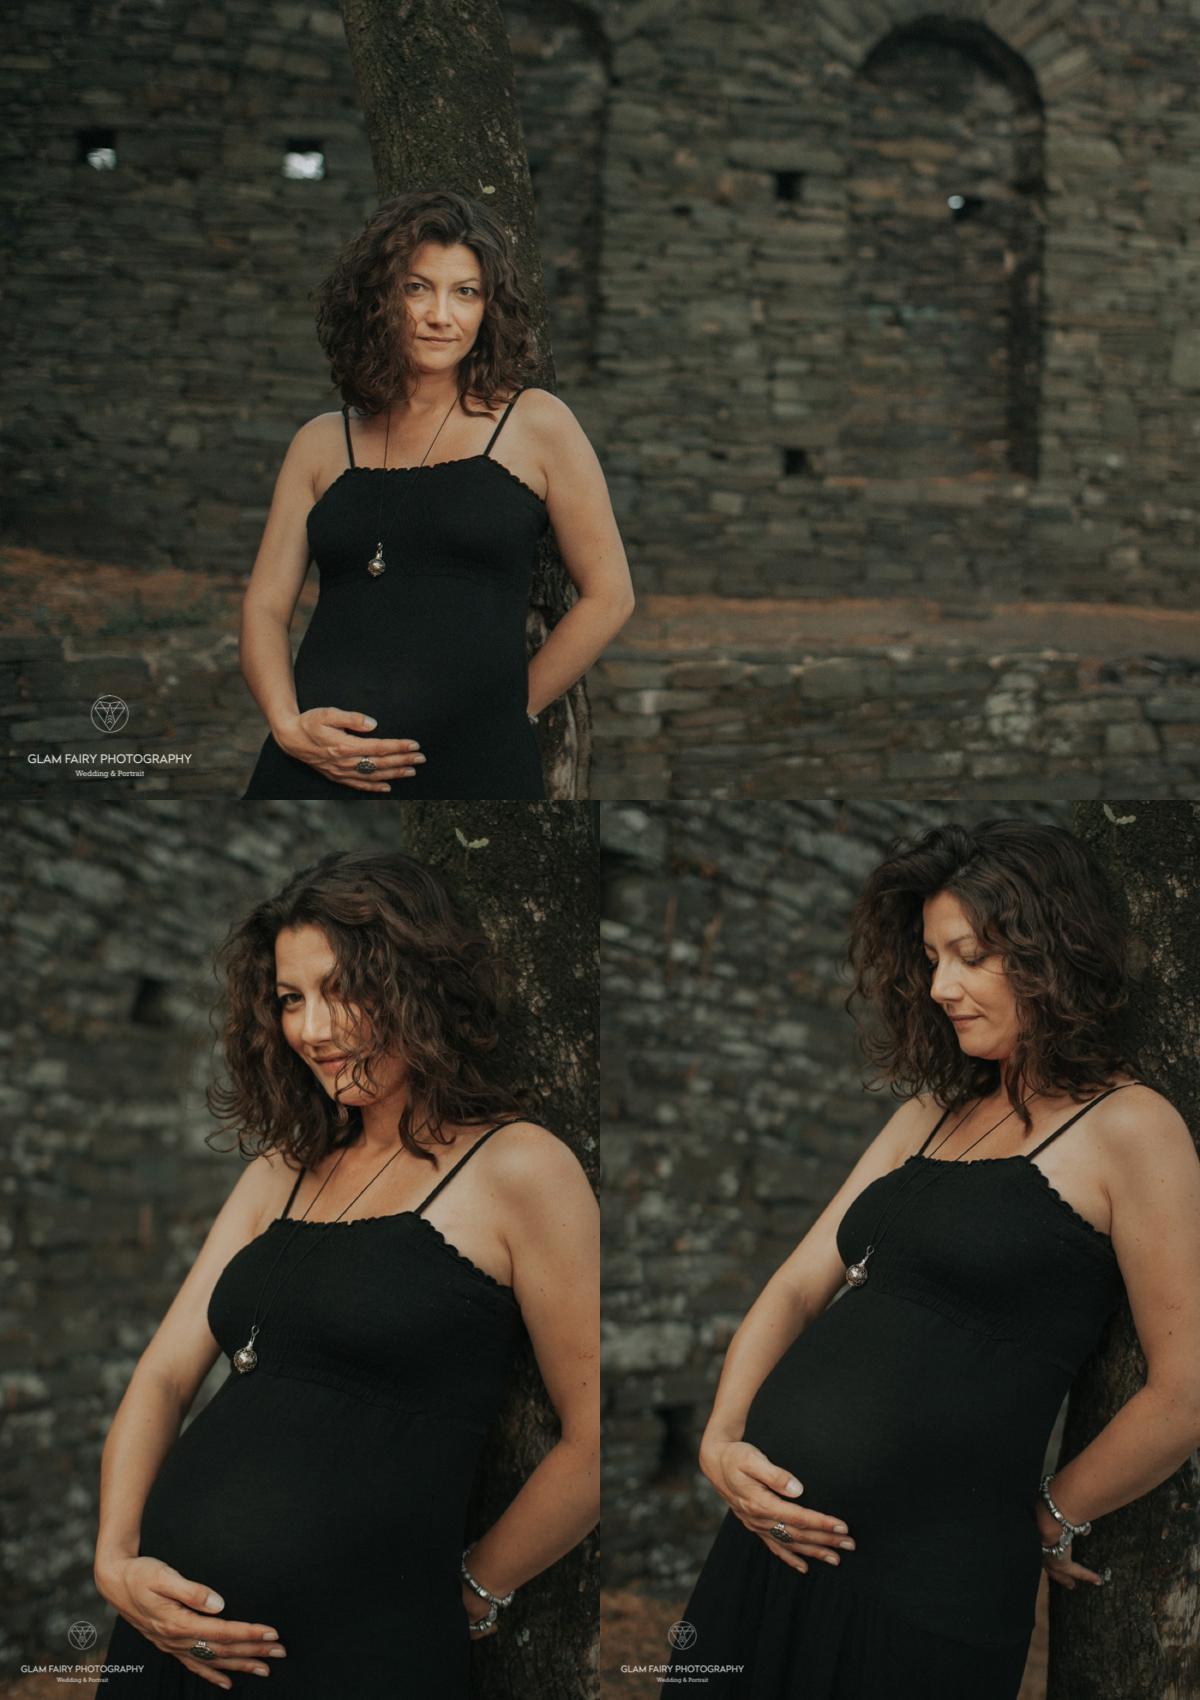 GlamFairyPhotography-photographe-seance-grossesse-le-cellier-bea_0002